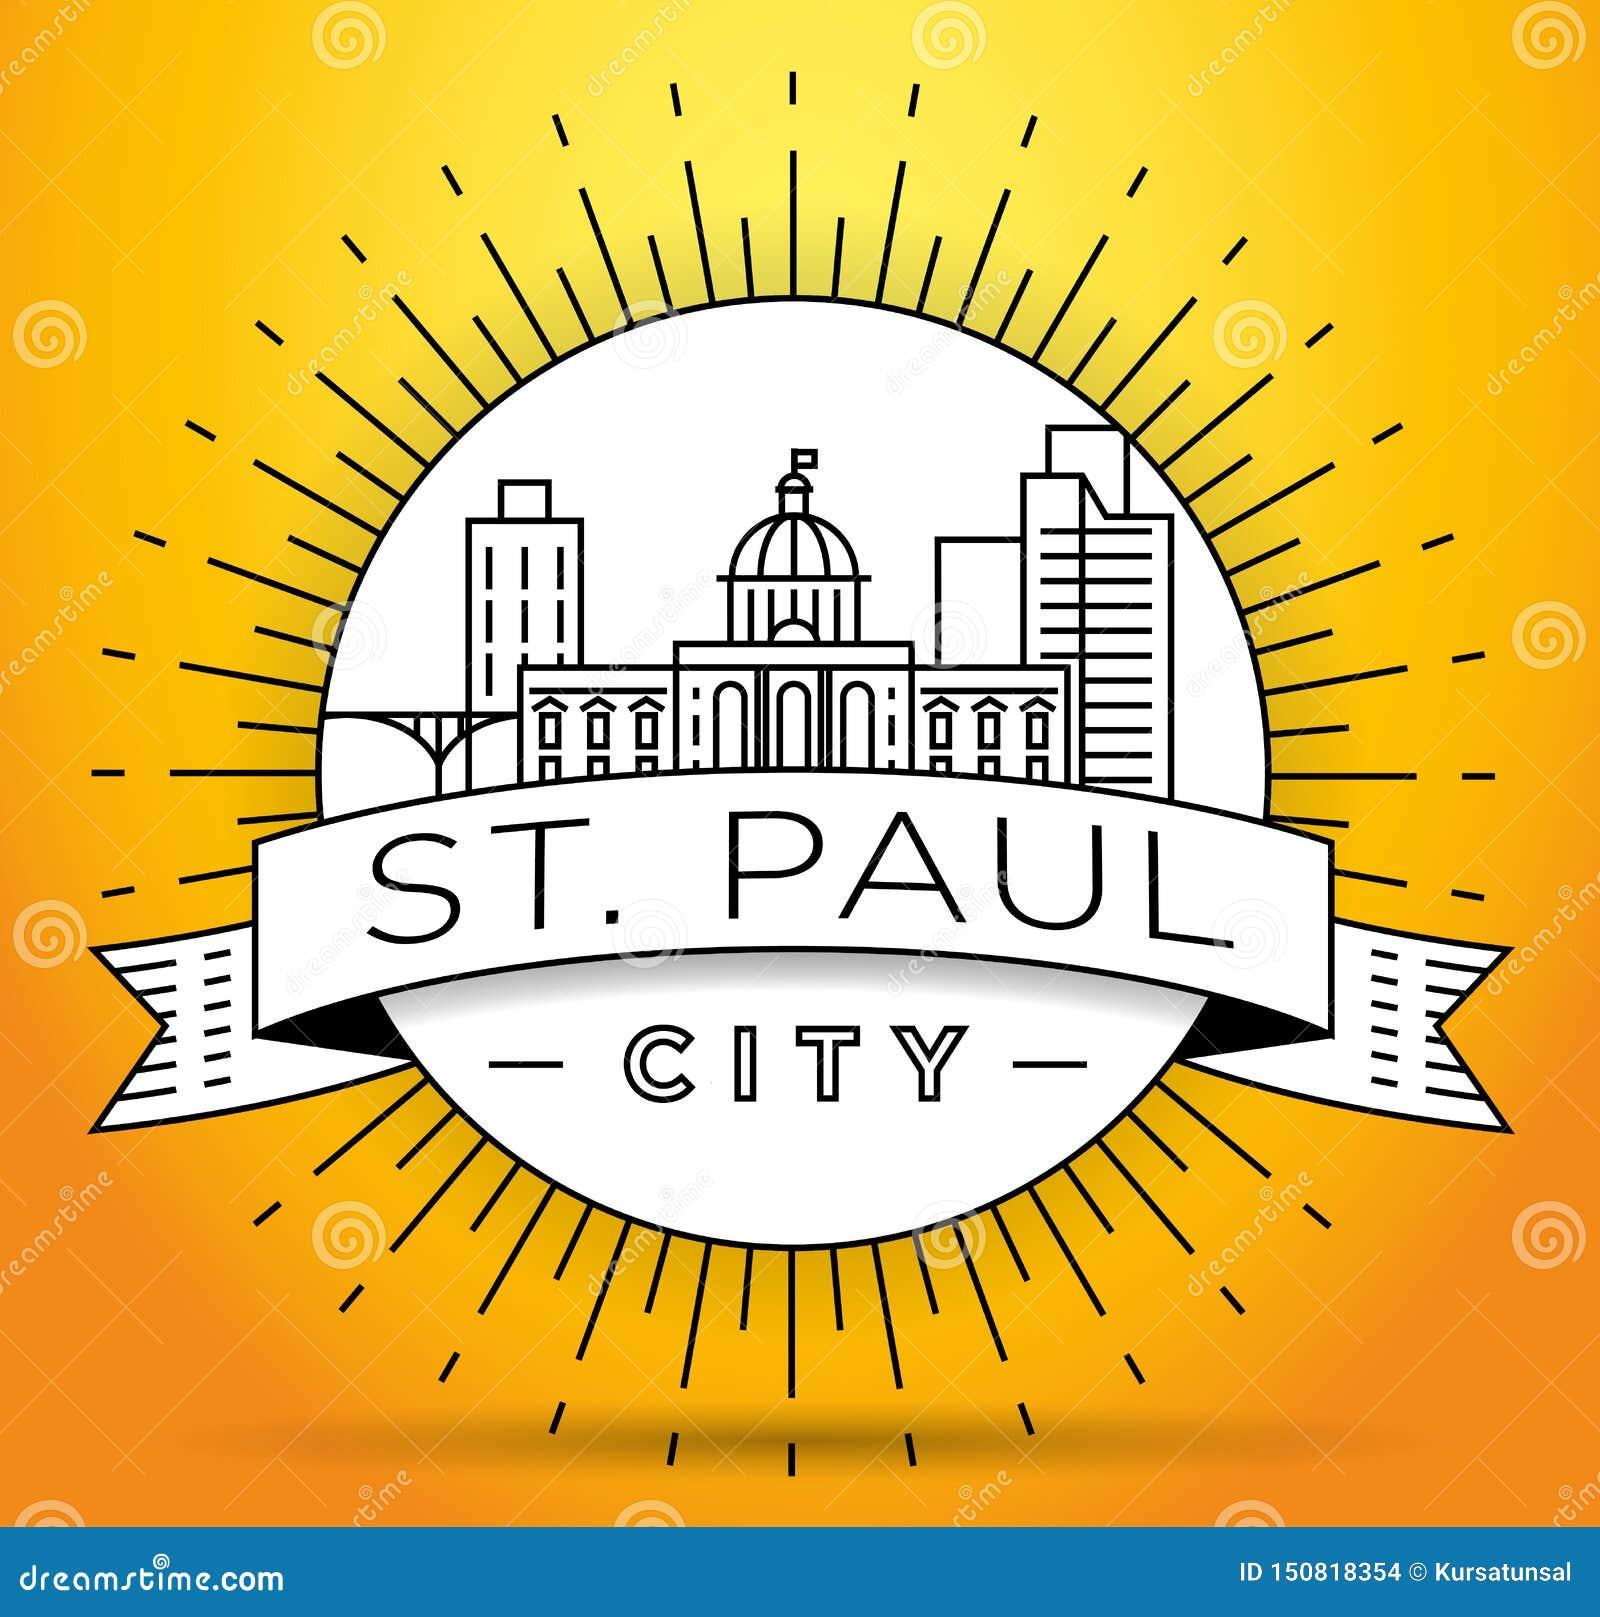 Minimales St. Paul City Linear Skyline mit typografischem Entwurf